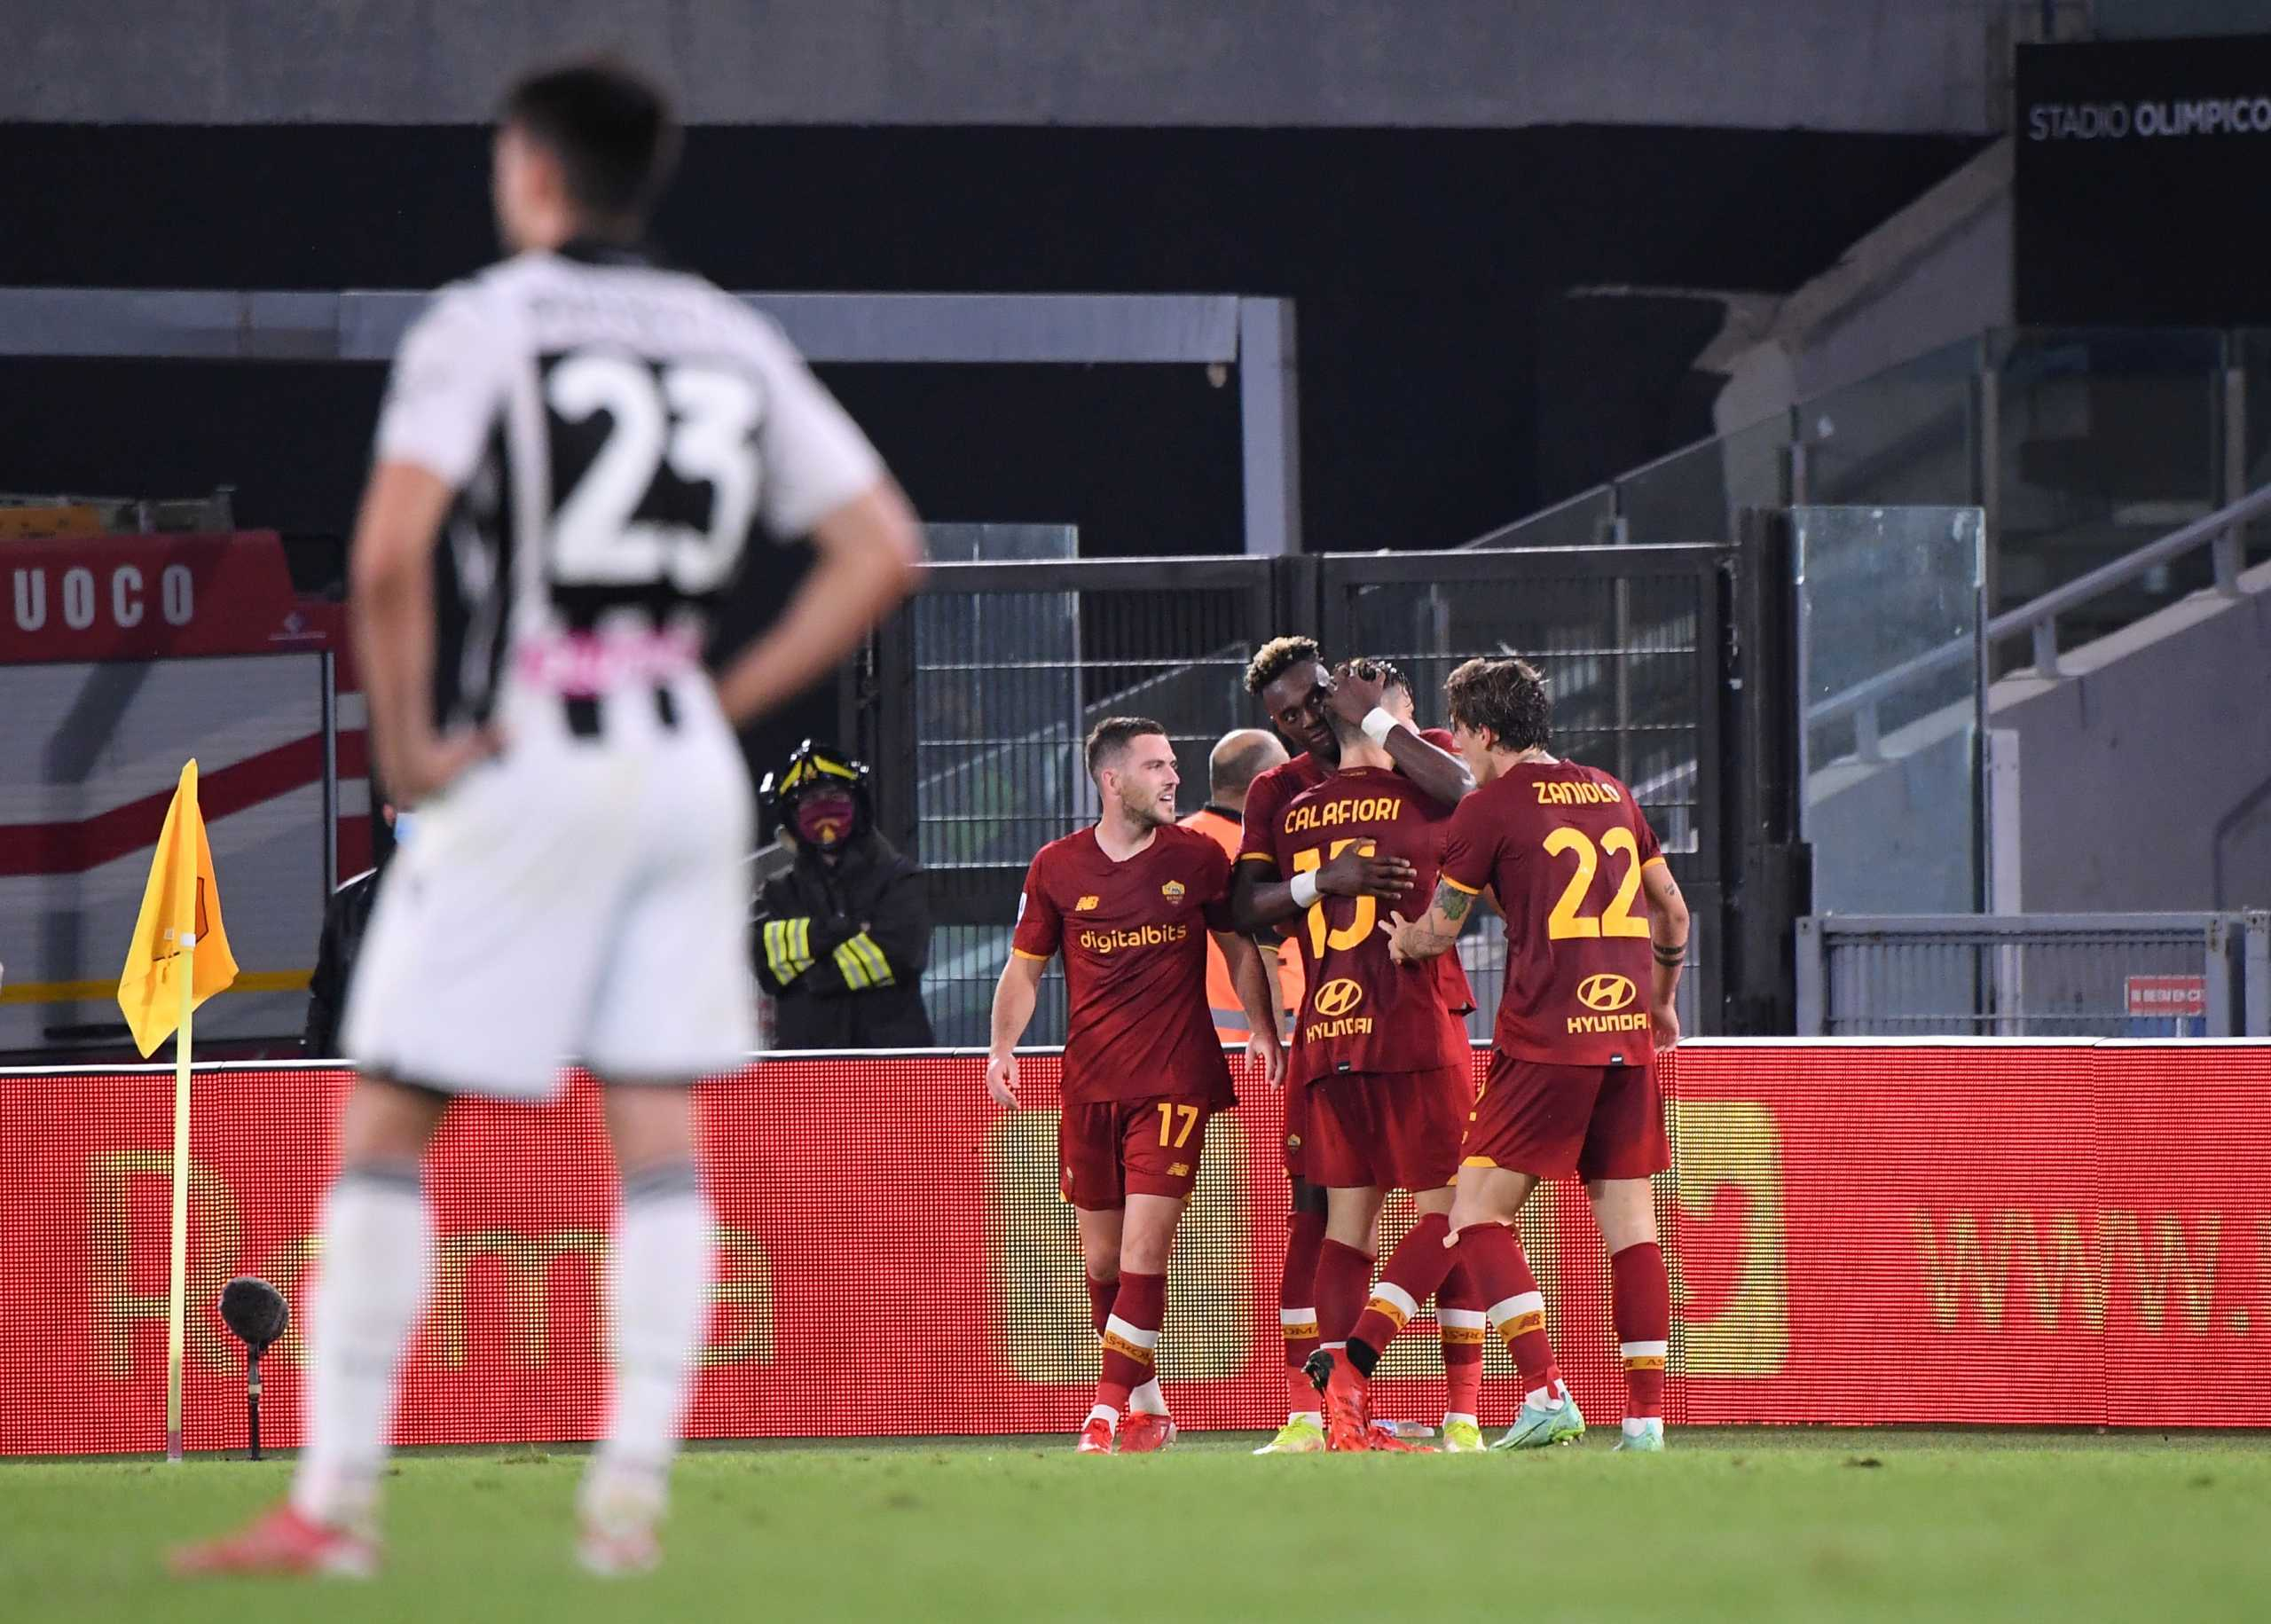 Serie A, Ρόμα – Ουντινέζε 1-0: Με Έιμπραχαμ επέστρεψαν στις νίκες οι Ρωμαίοι του Μουρίνιο